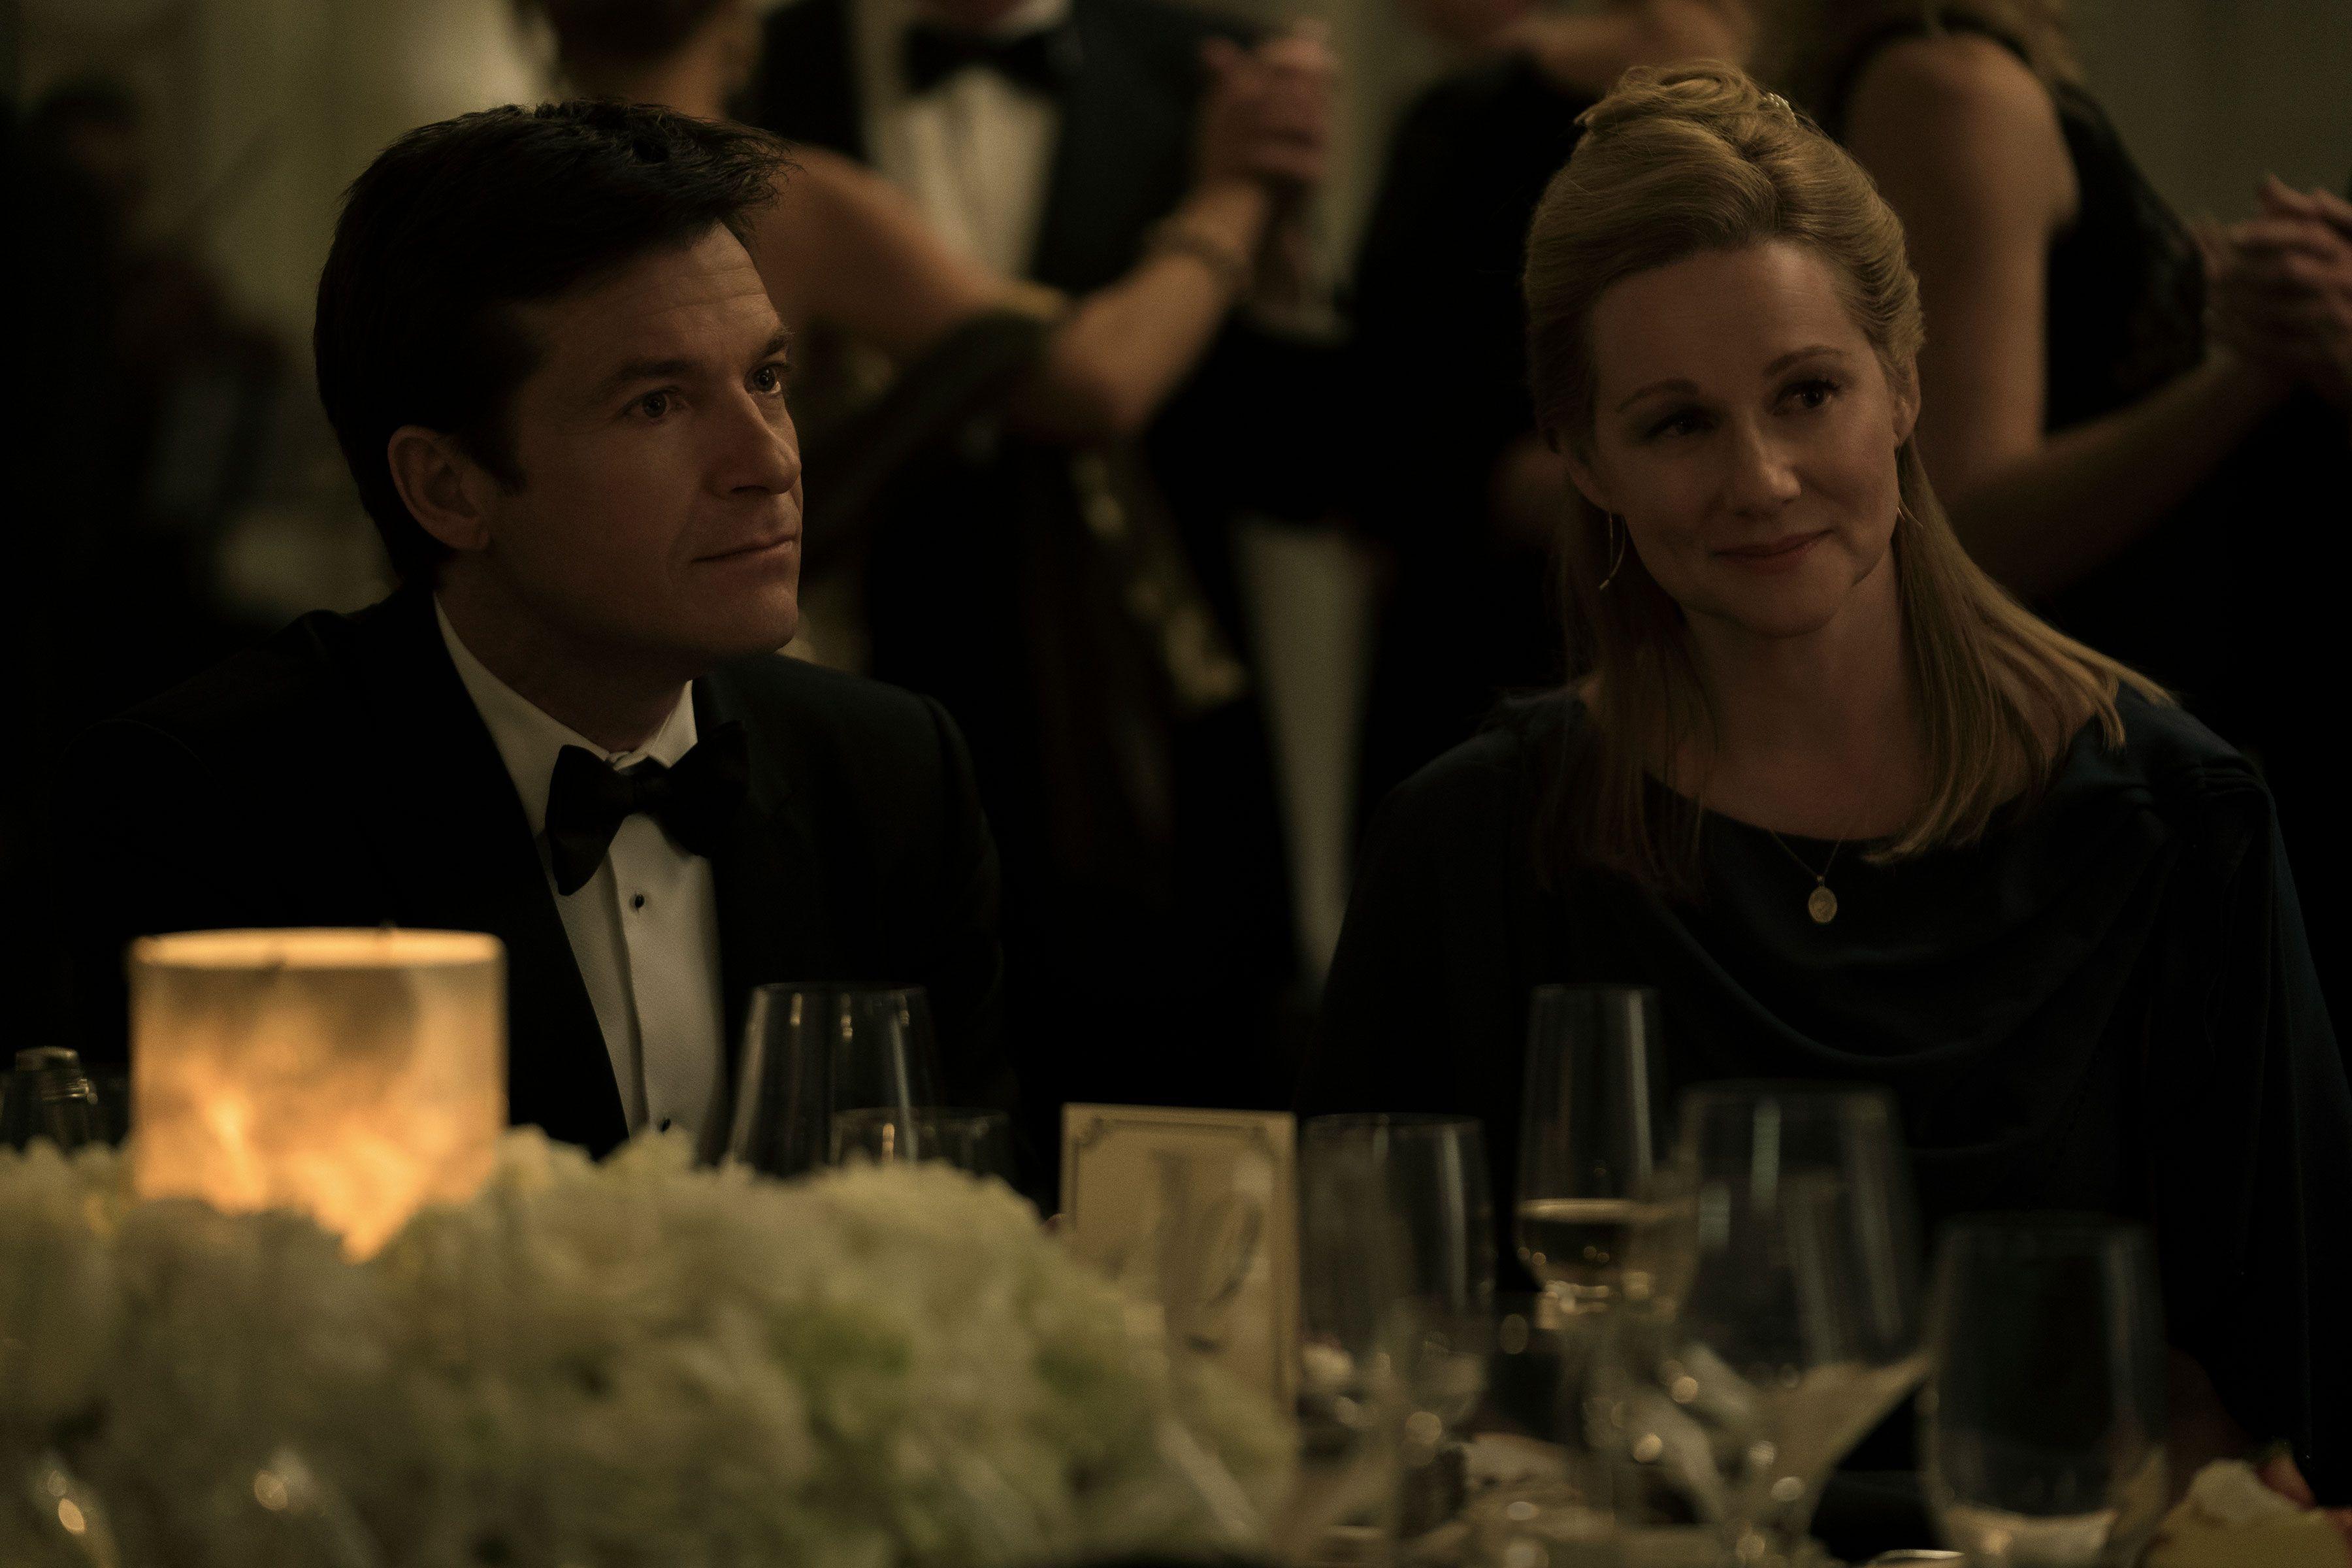 Ozark' Season 3 News, Air Date, Cast & Trailer - Everything